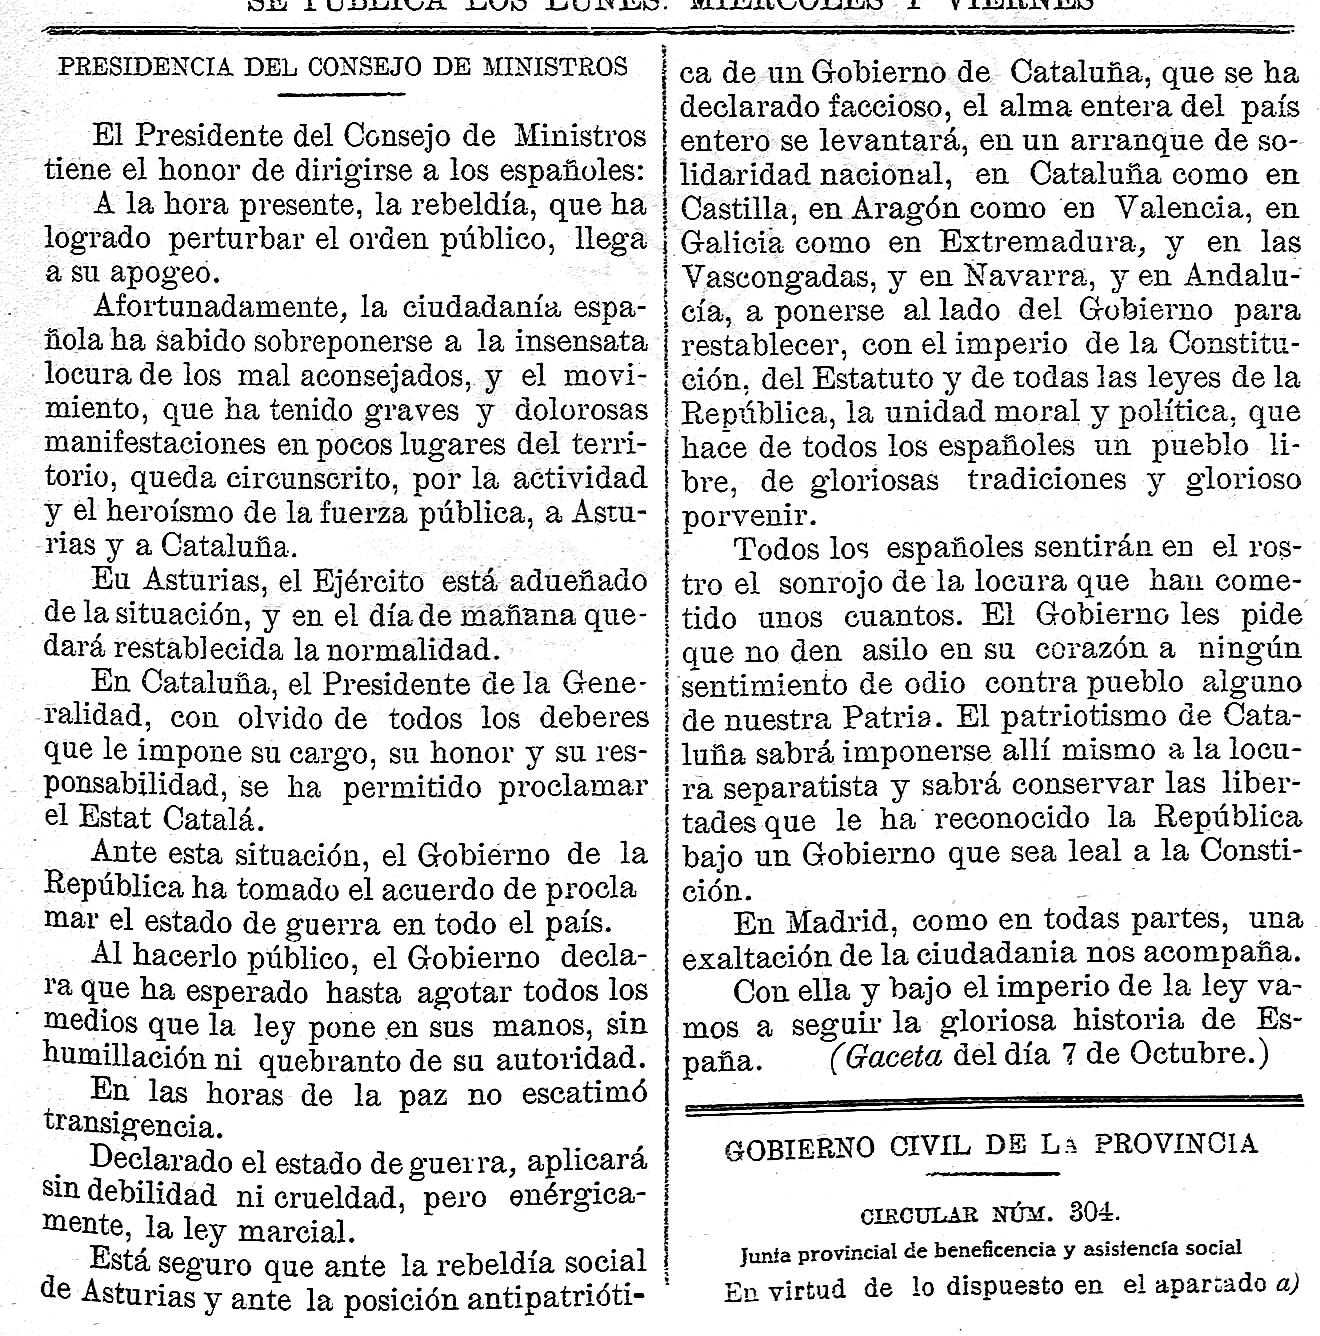 Boletín Oficial de la Provincia de Soria, 10 de octubre de 1934, p. 1.